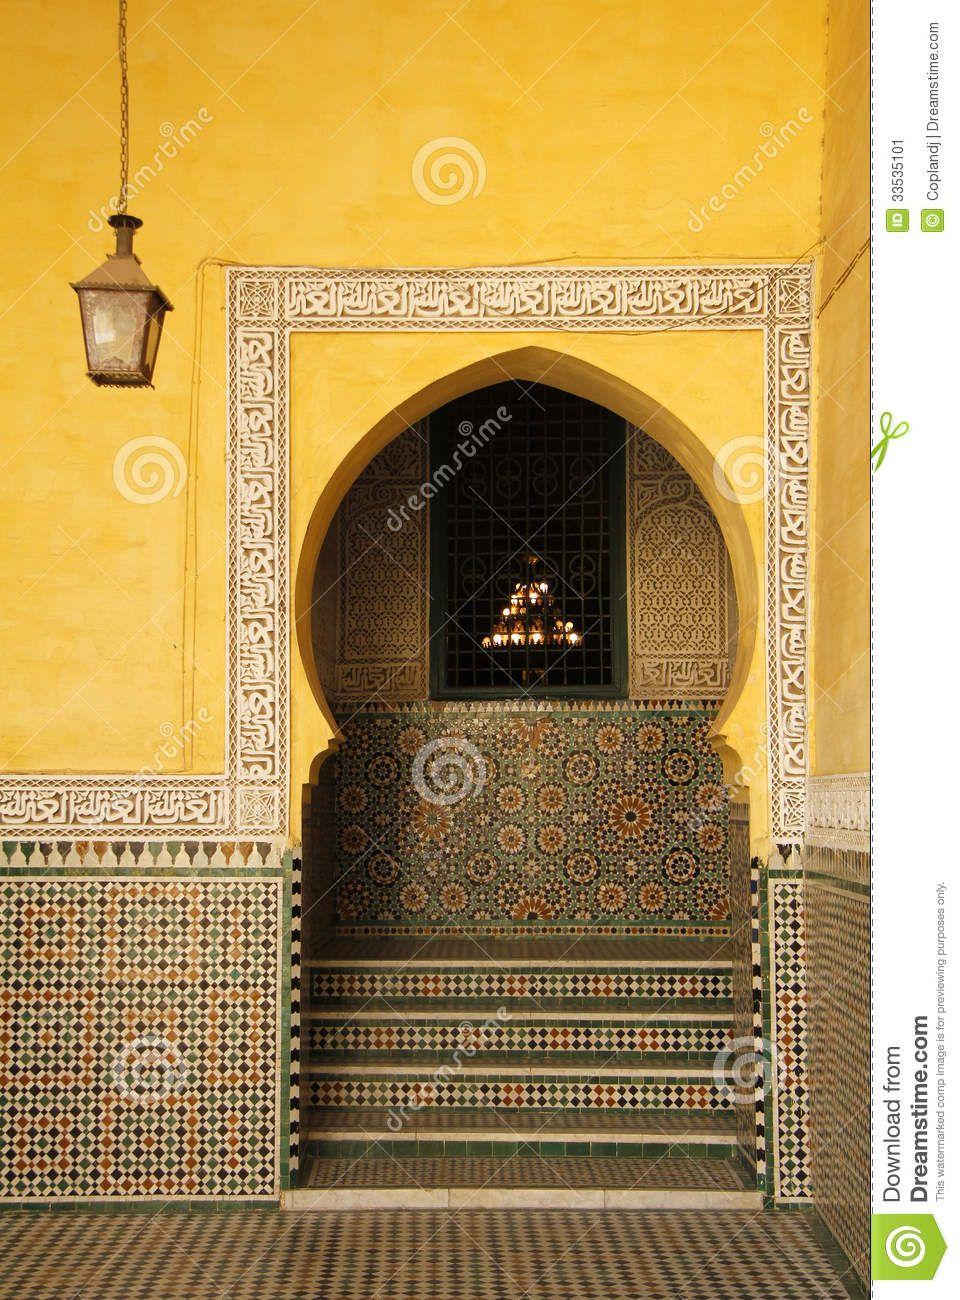 moroccan arch - Google Search | Sky Wagon | Pinterest | Arch ...